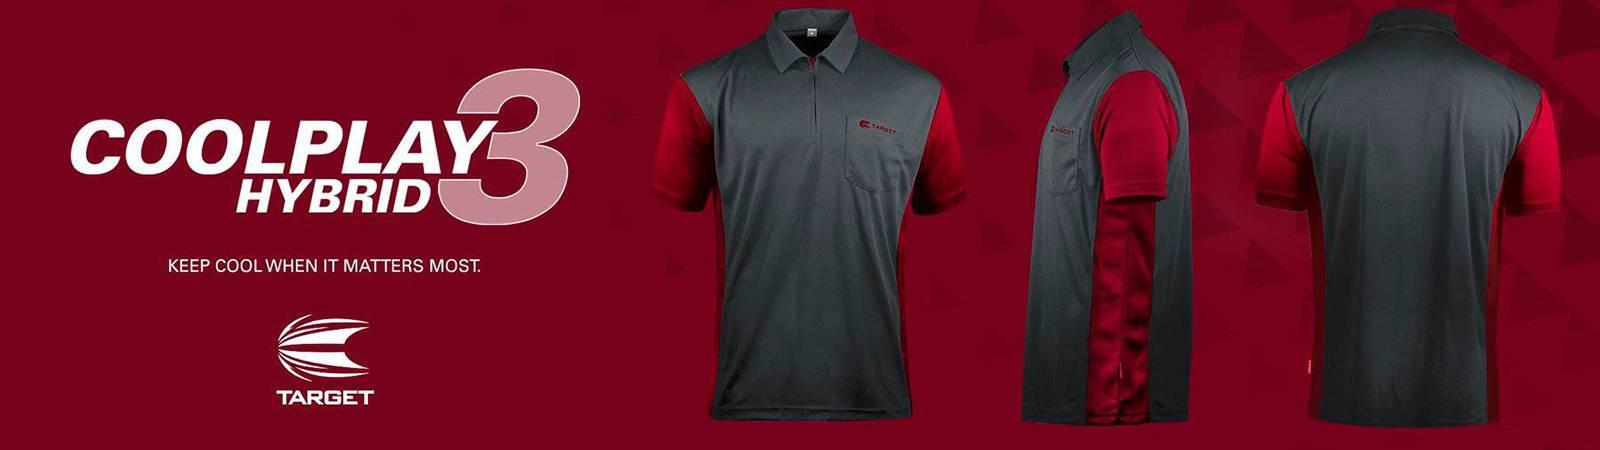 Target Coolplay 3 Hybrid Dartshirts